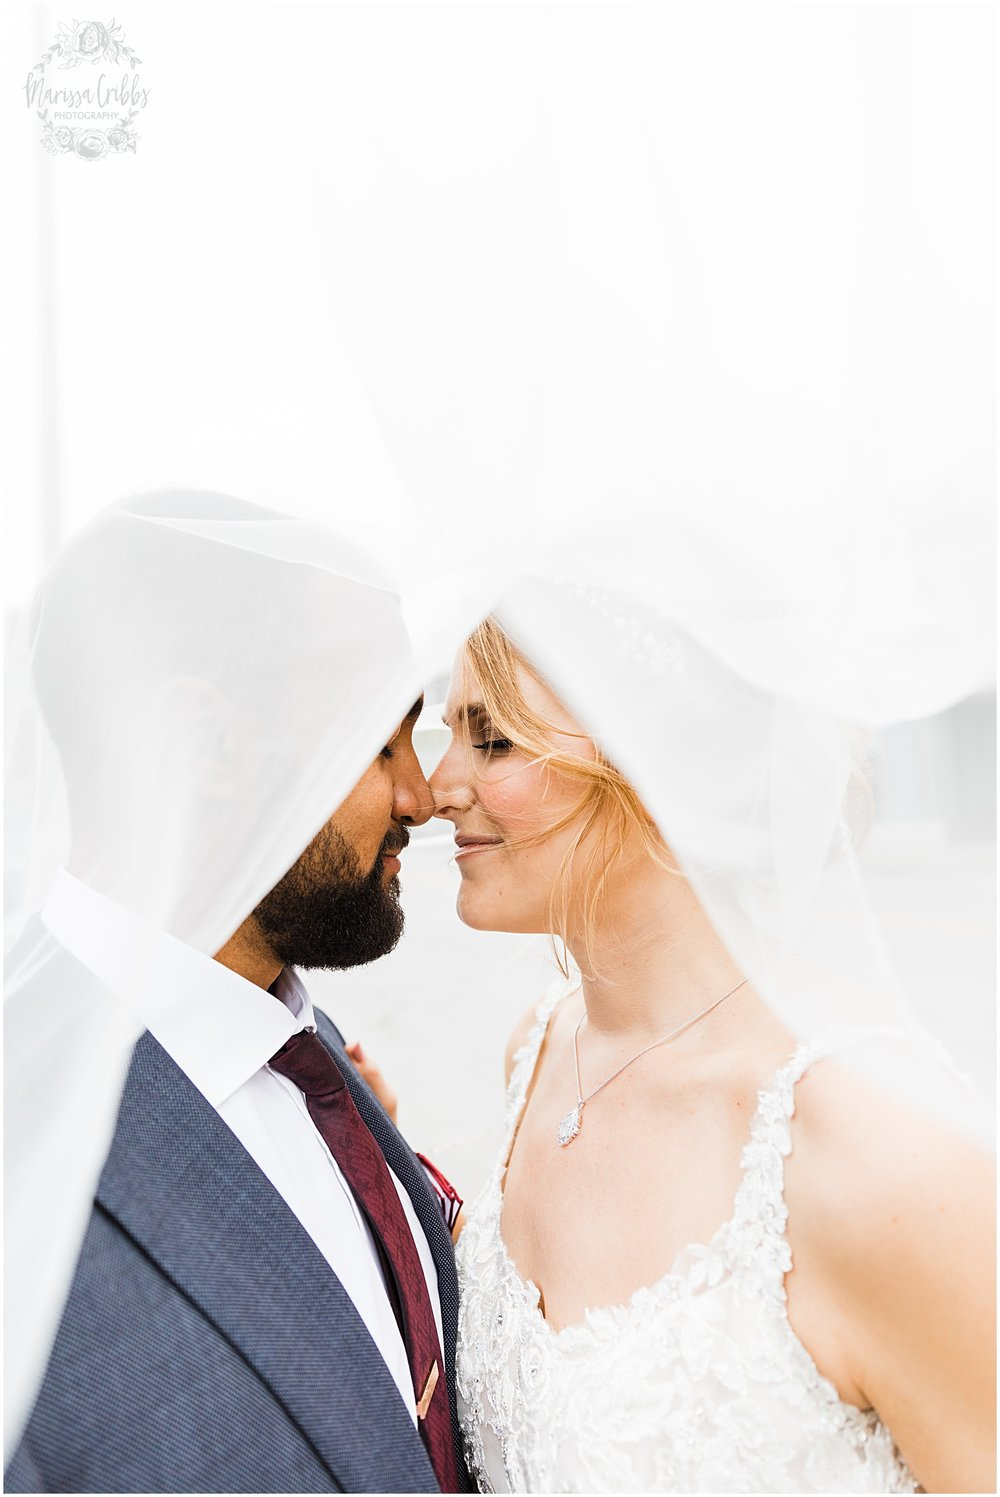 BAUER WEDDING   KELSEA & JUSTIN   MARISSA CRIBBS PHOTOGRAPHY_6544.jpg